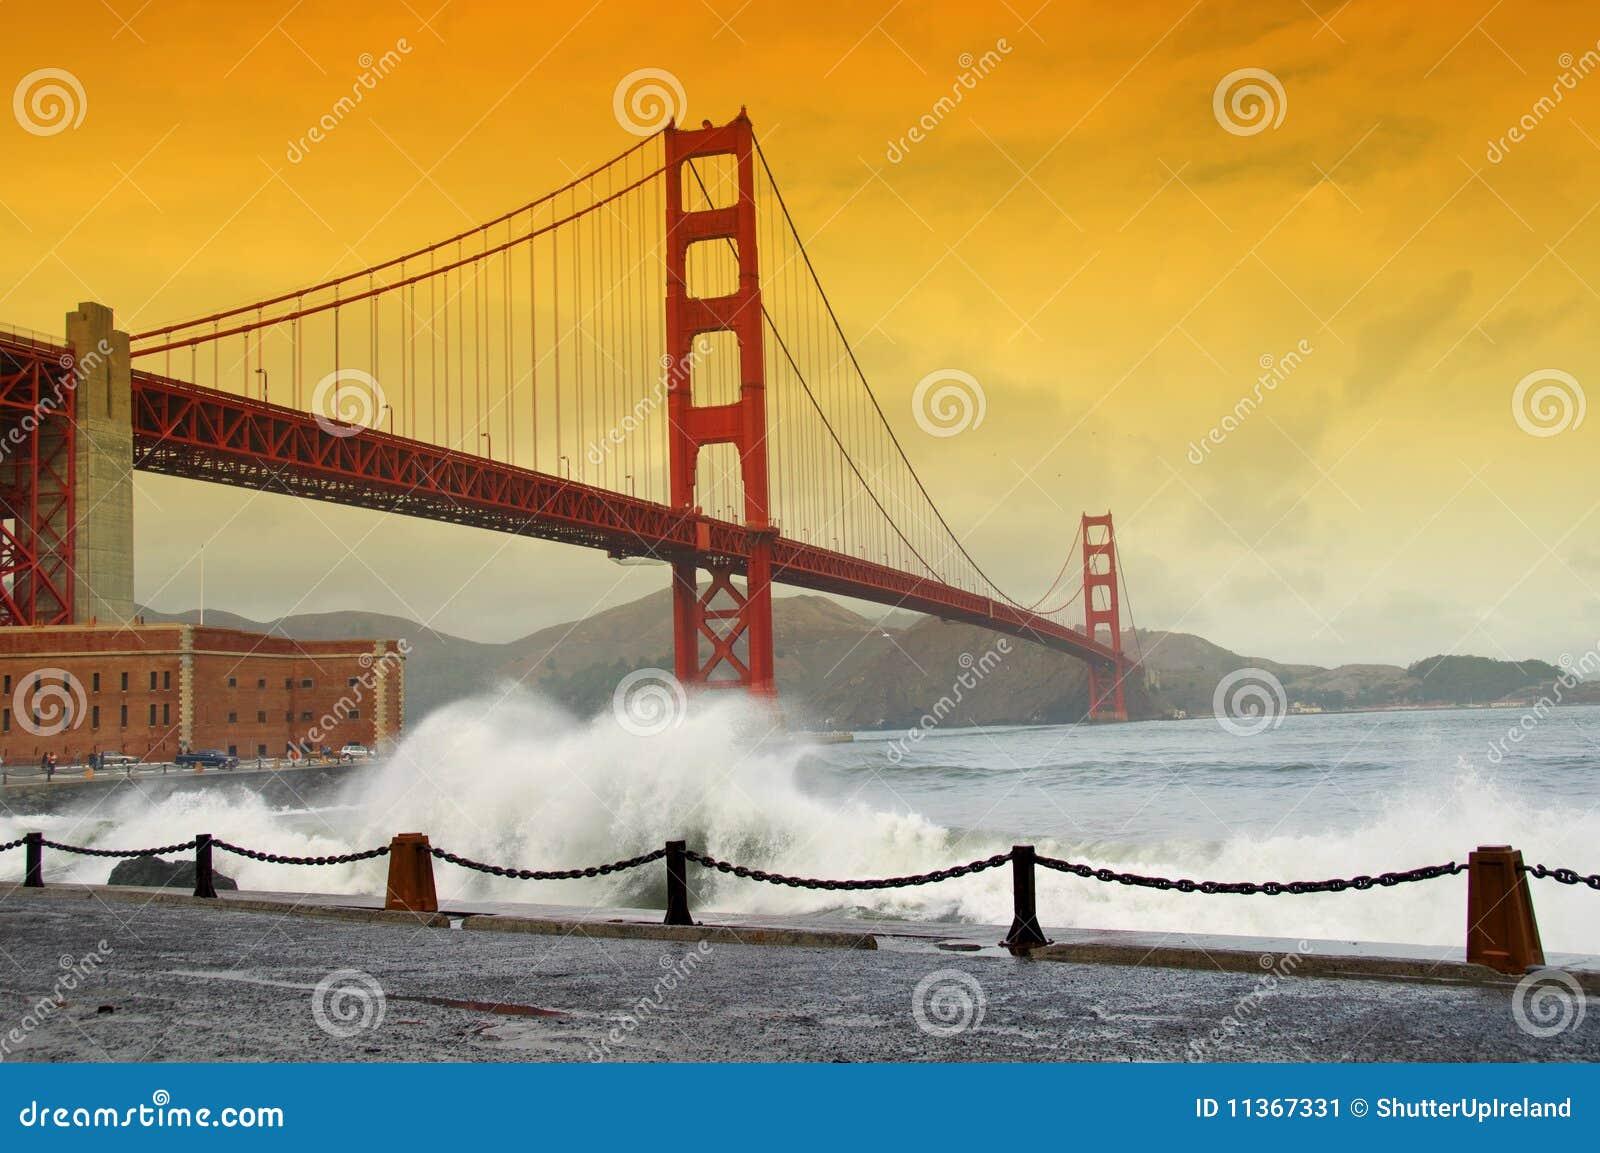 Golden gate bridge, san francisco, ca, usa